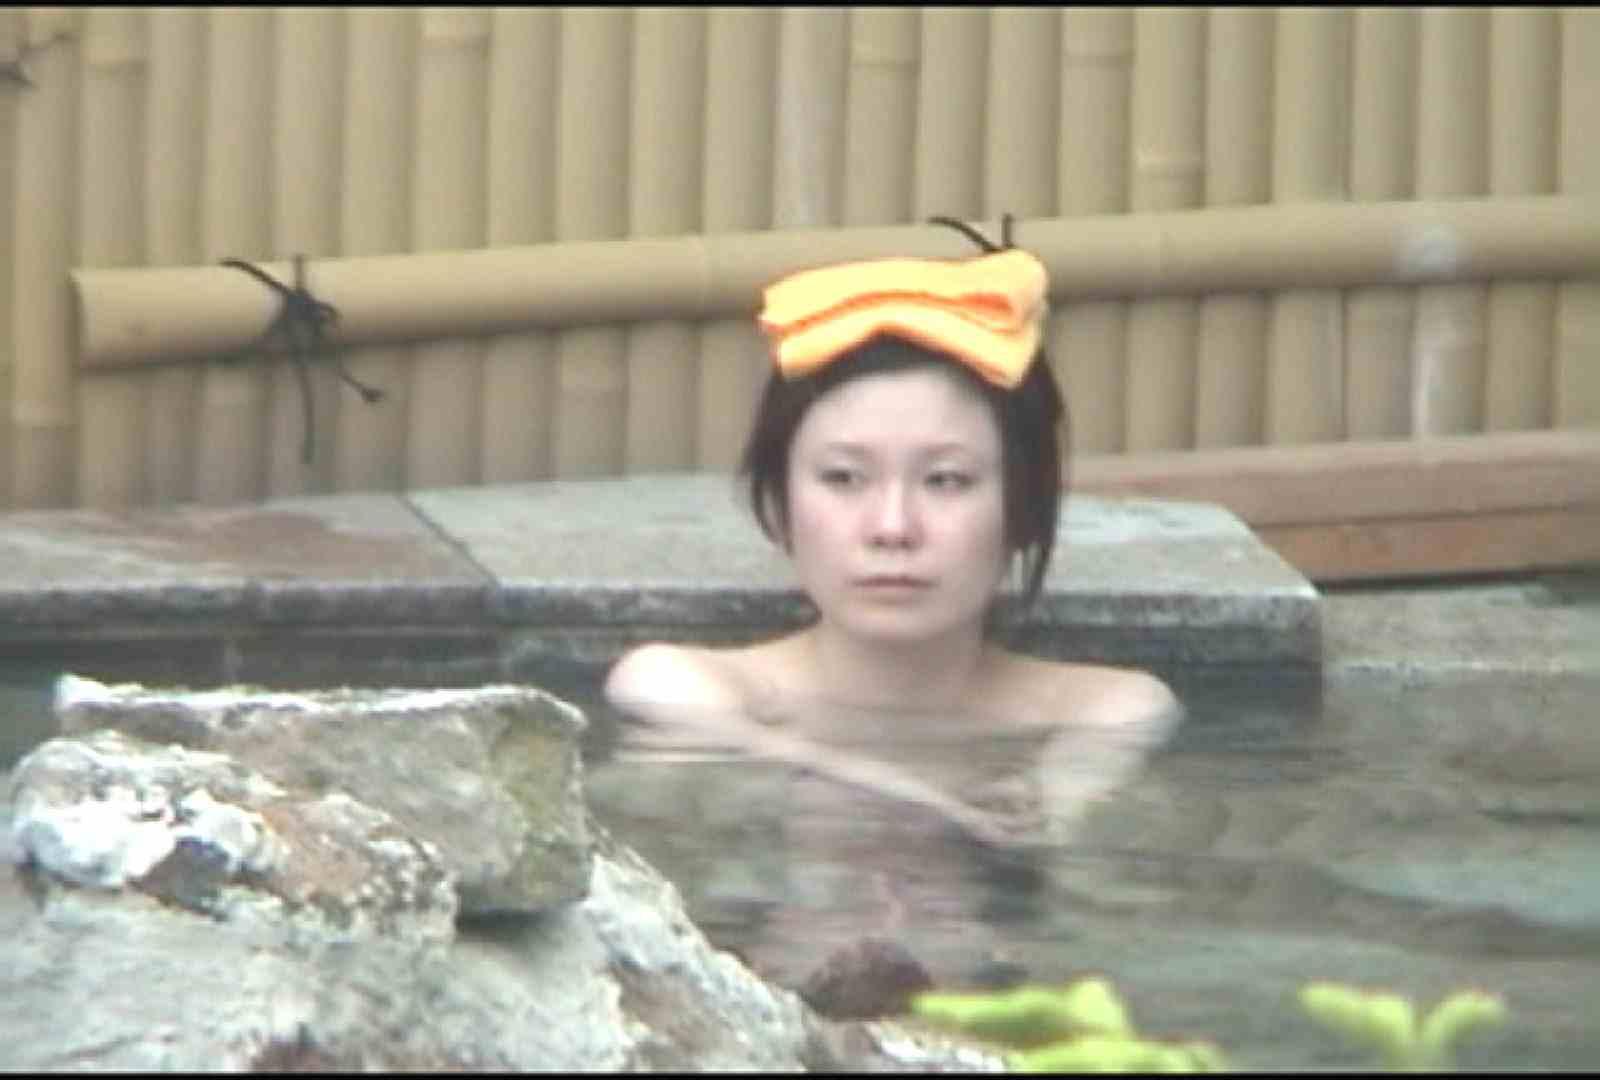 Aquaな露天風呂Vol.177 綺麗なOLたち アダルト動画キャプチャ 112枚 38